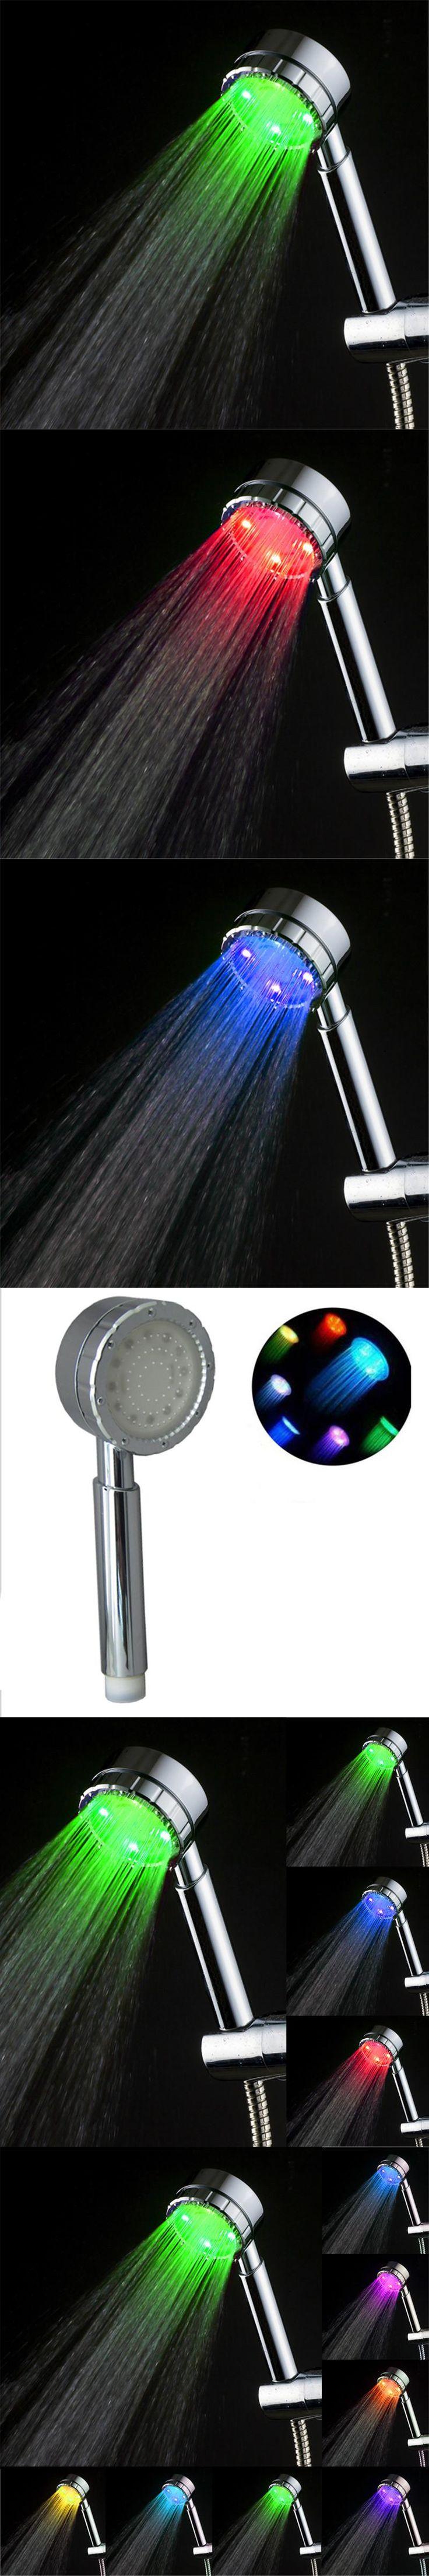 48 pcs Round Romantic LED Shower Head Bathroom 7 Colors Big Handheld Shower Nozzle Rainfall